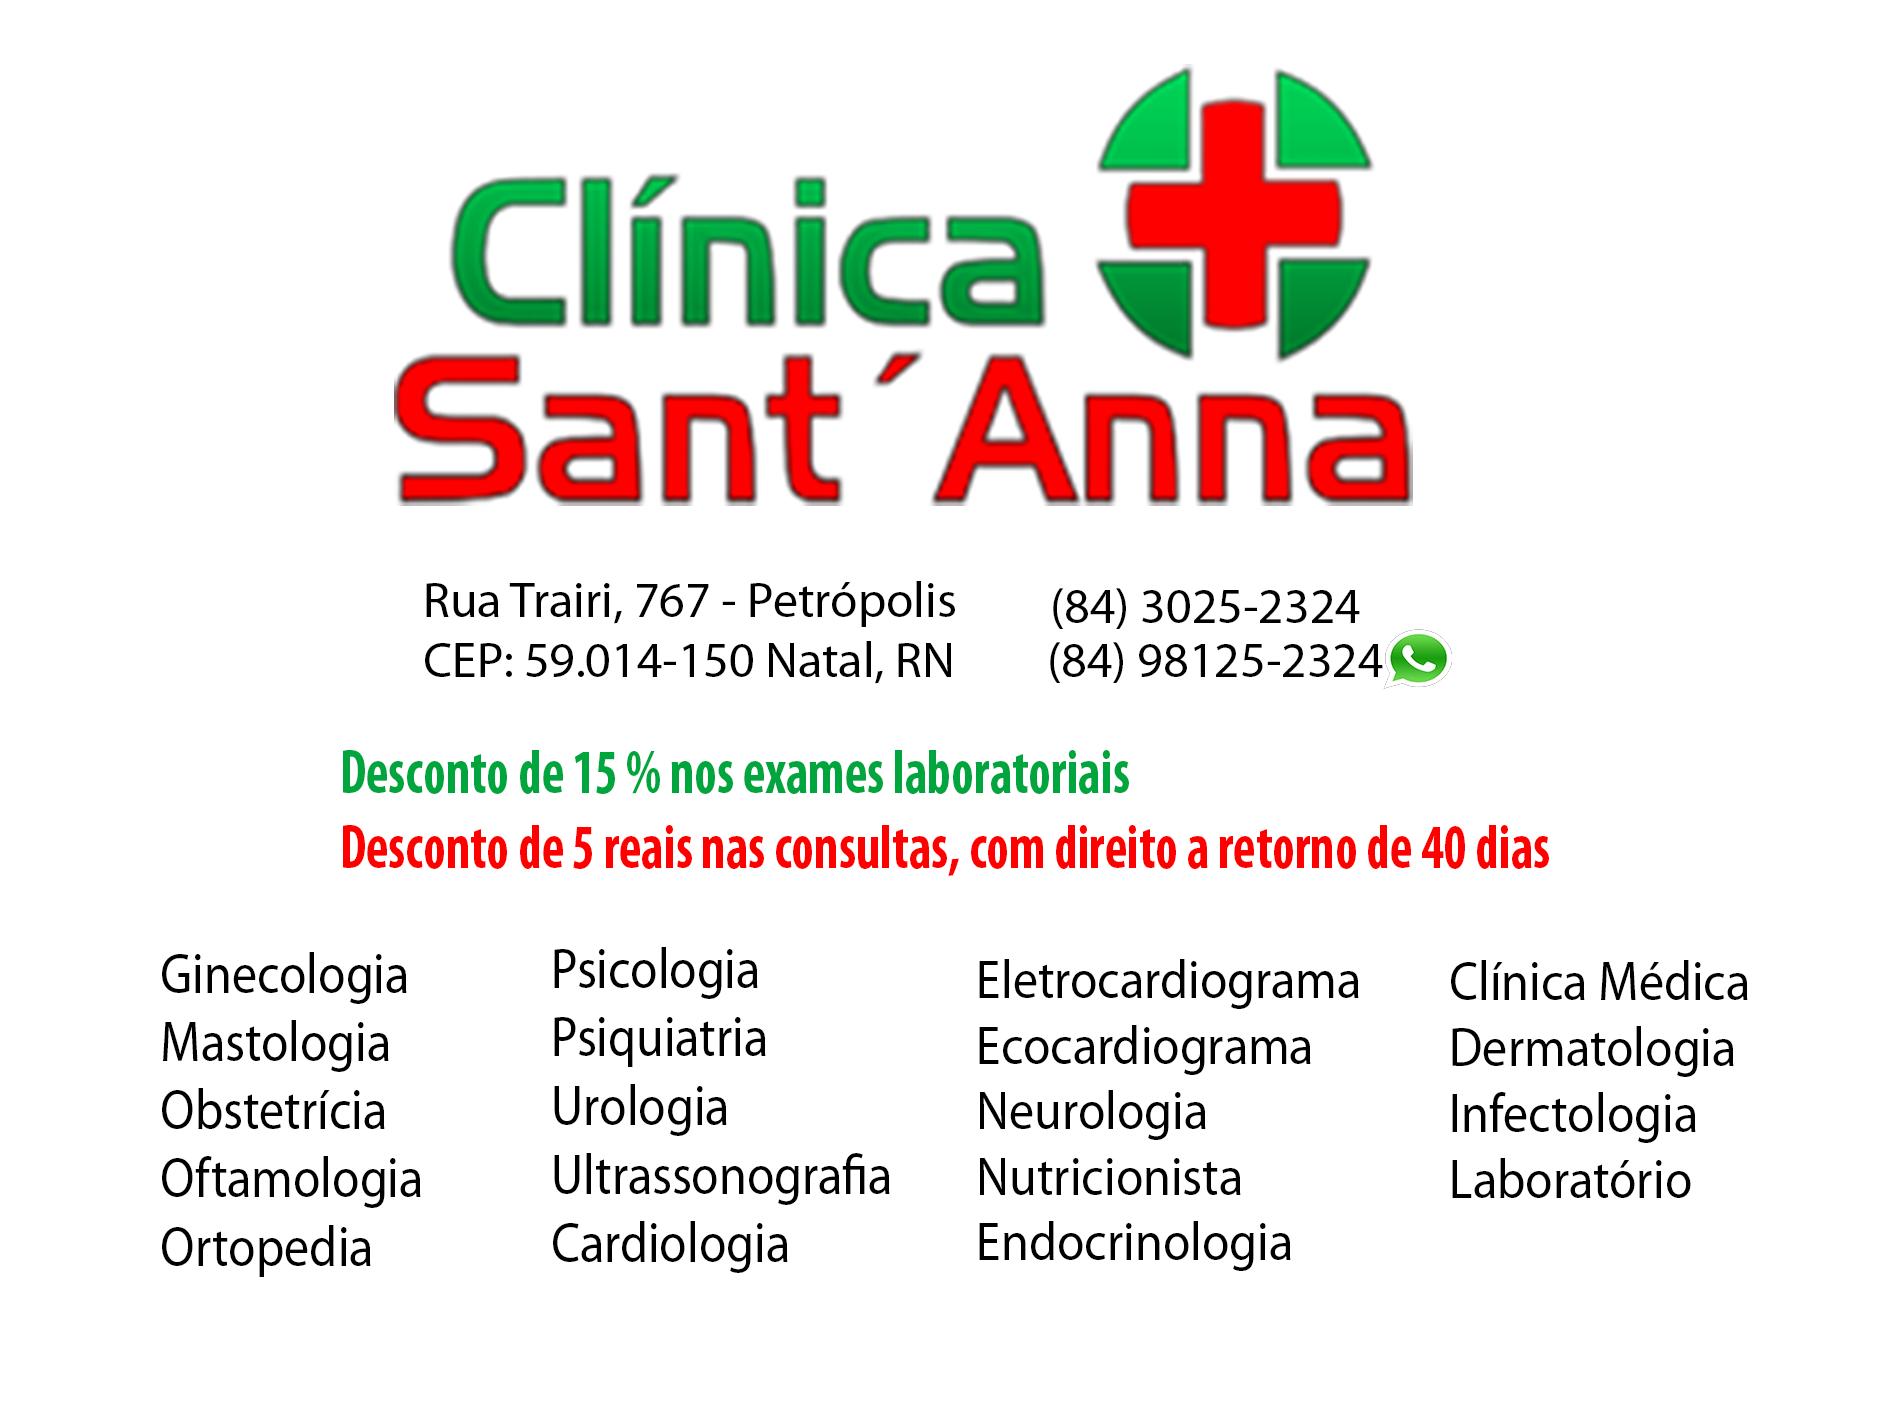 Clinica SantAnna